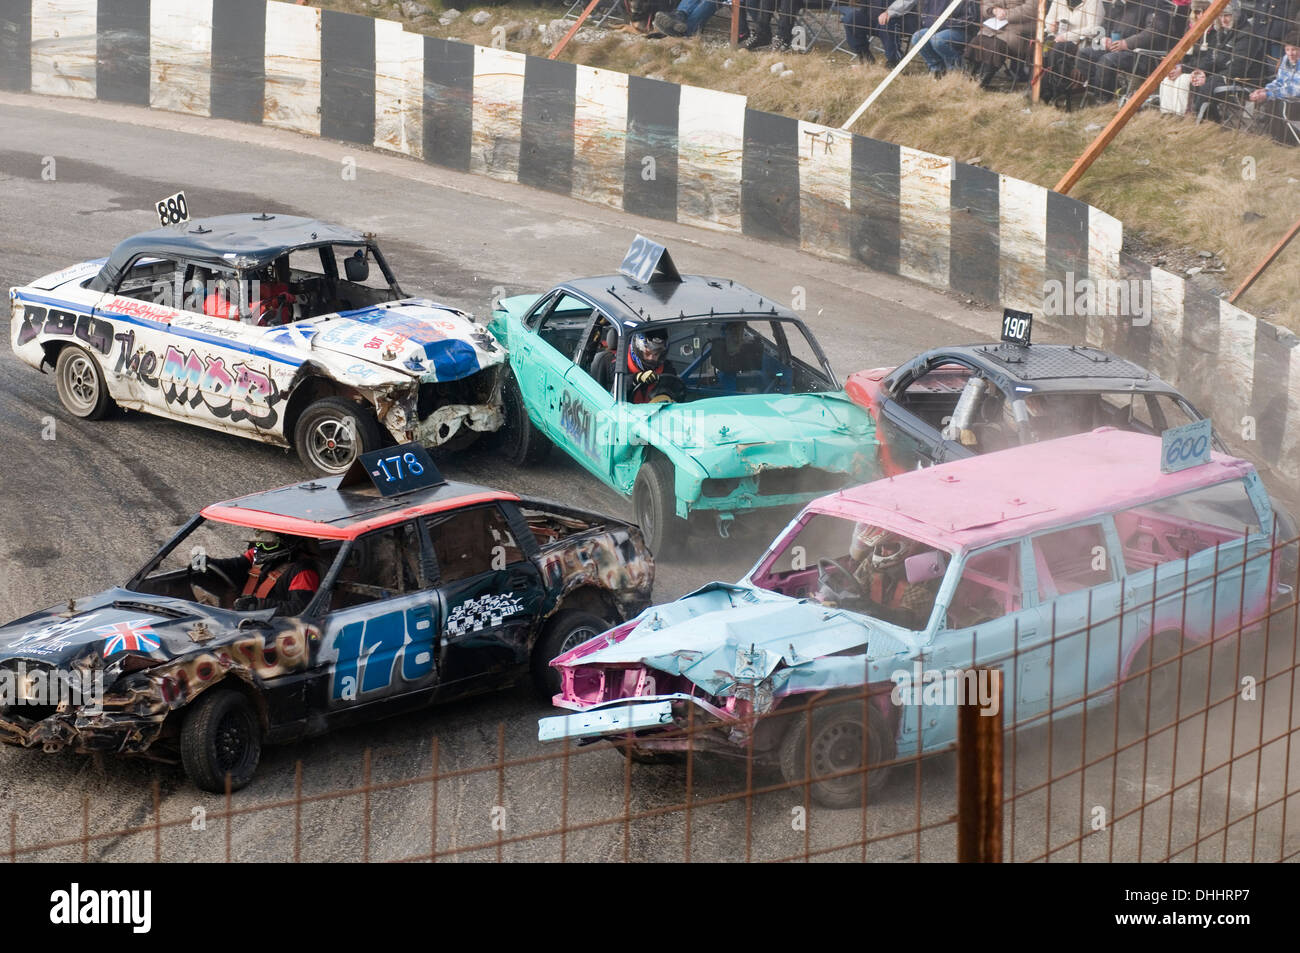 banger racing ace races demolition derby derbies destruction demo ...